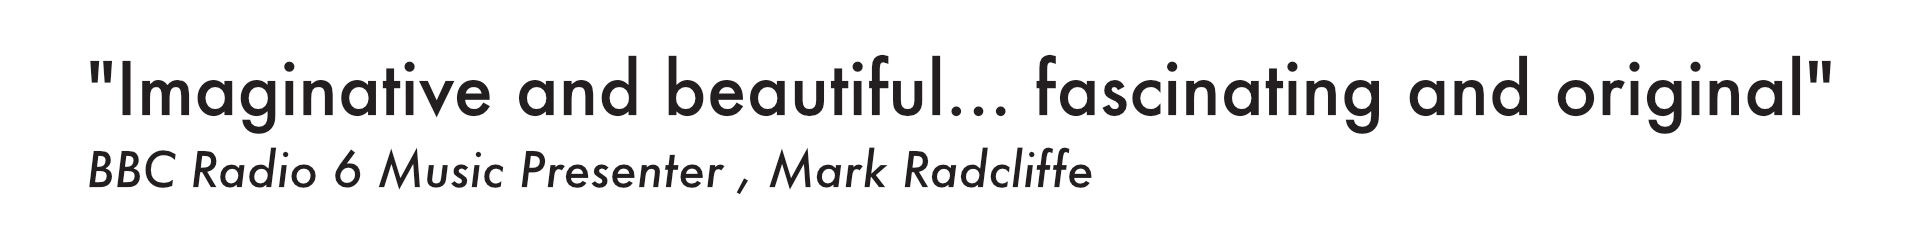 Mark Radcliffe.jpg